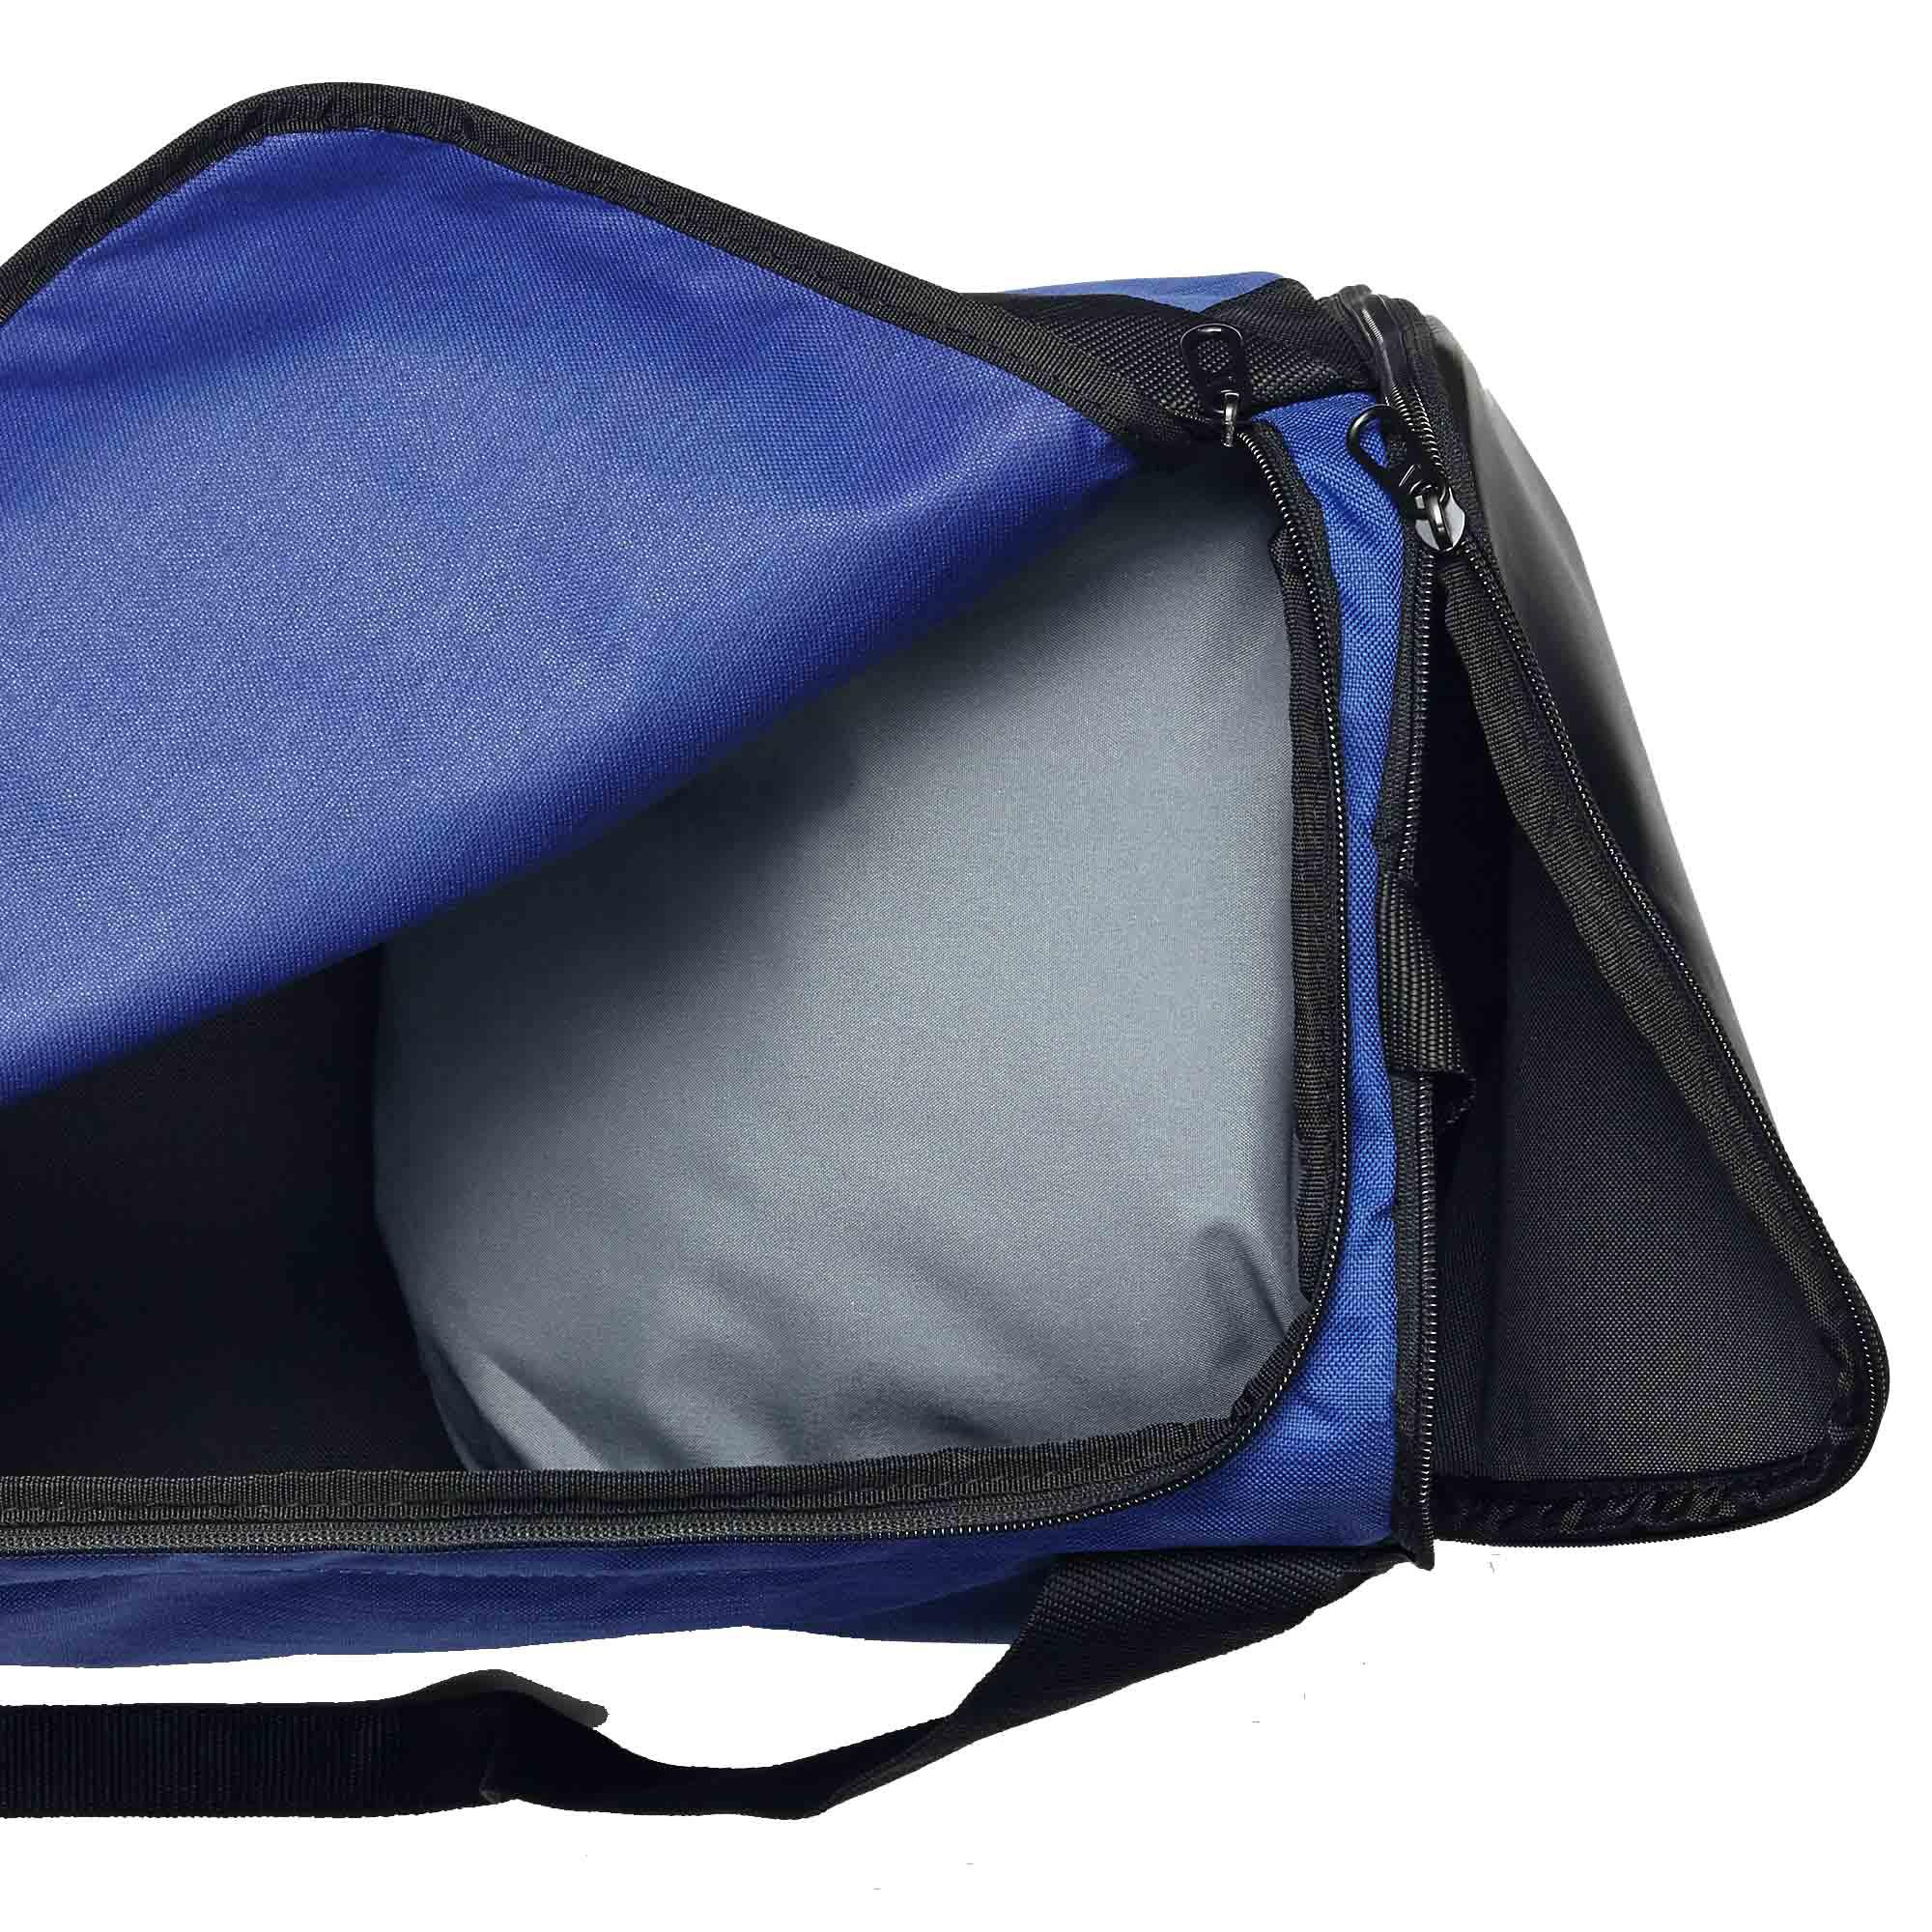 Bolsa Nike Brasilia Duffel Small 40L Azul/Preta  - REAL ESPORTE